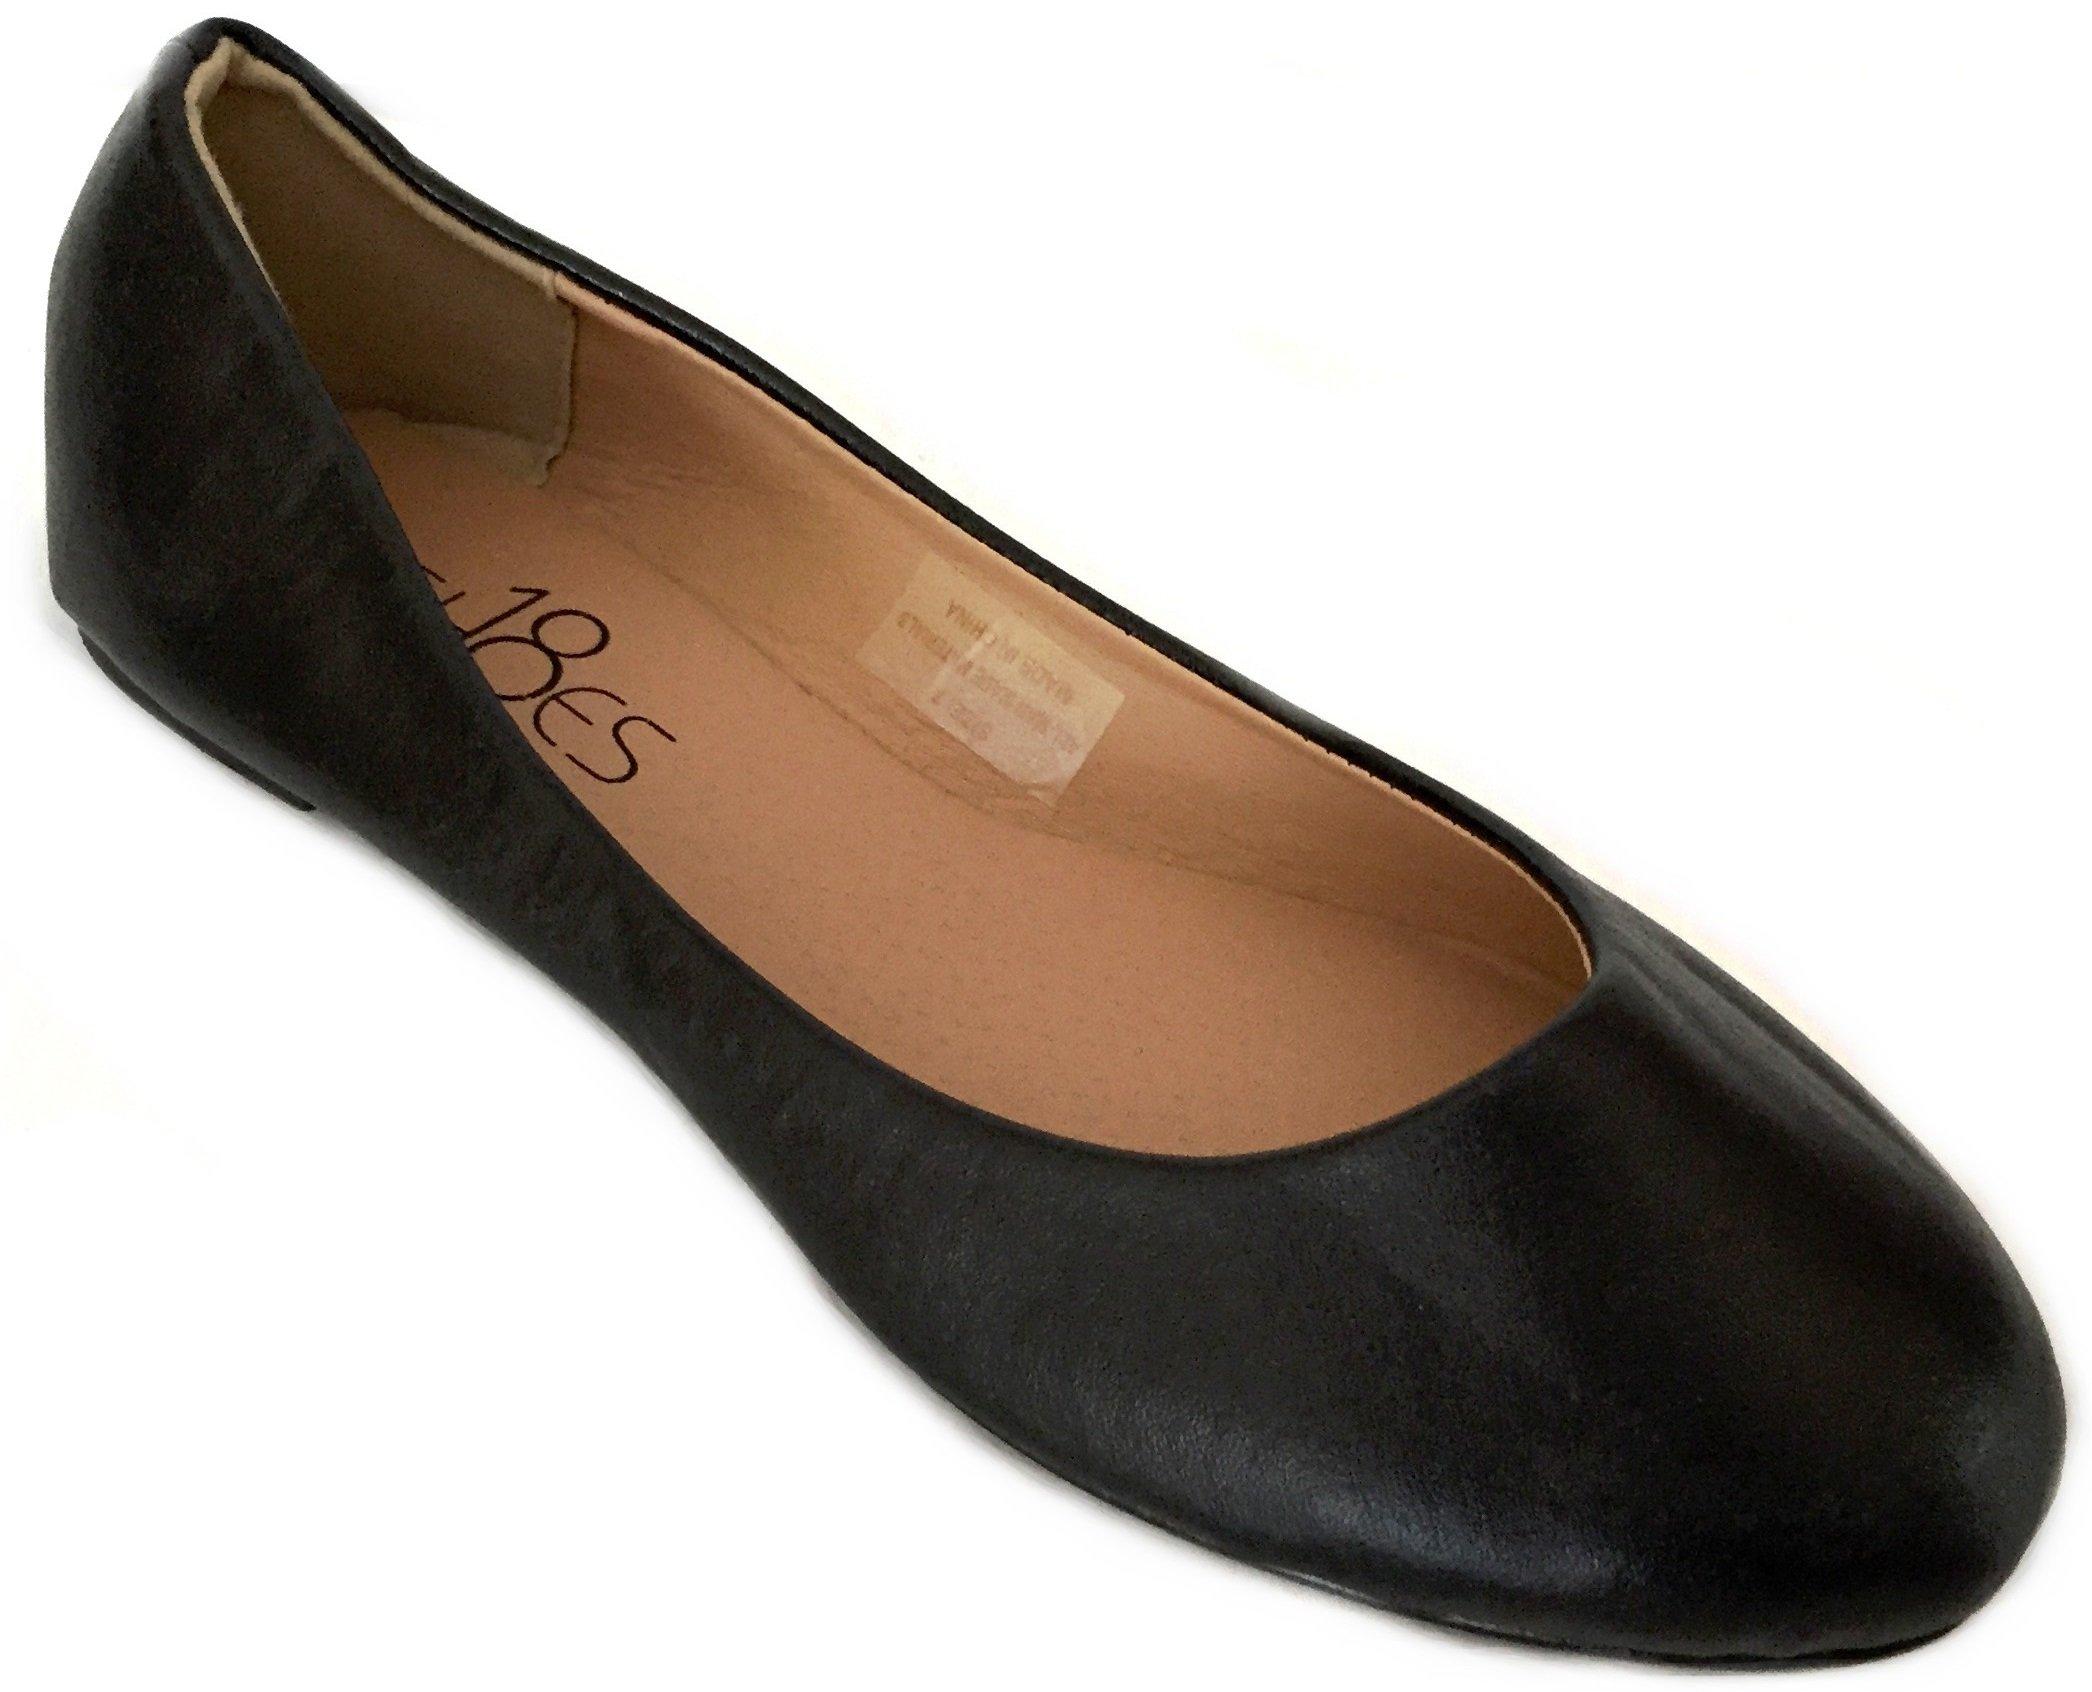 Shoes 18 Womens Ballerina Ballet Flat Shoes Solids & Leopards (11, Black PU 8600)